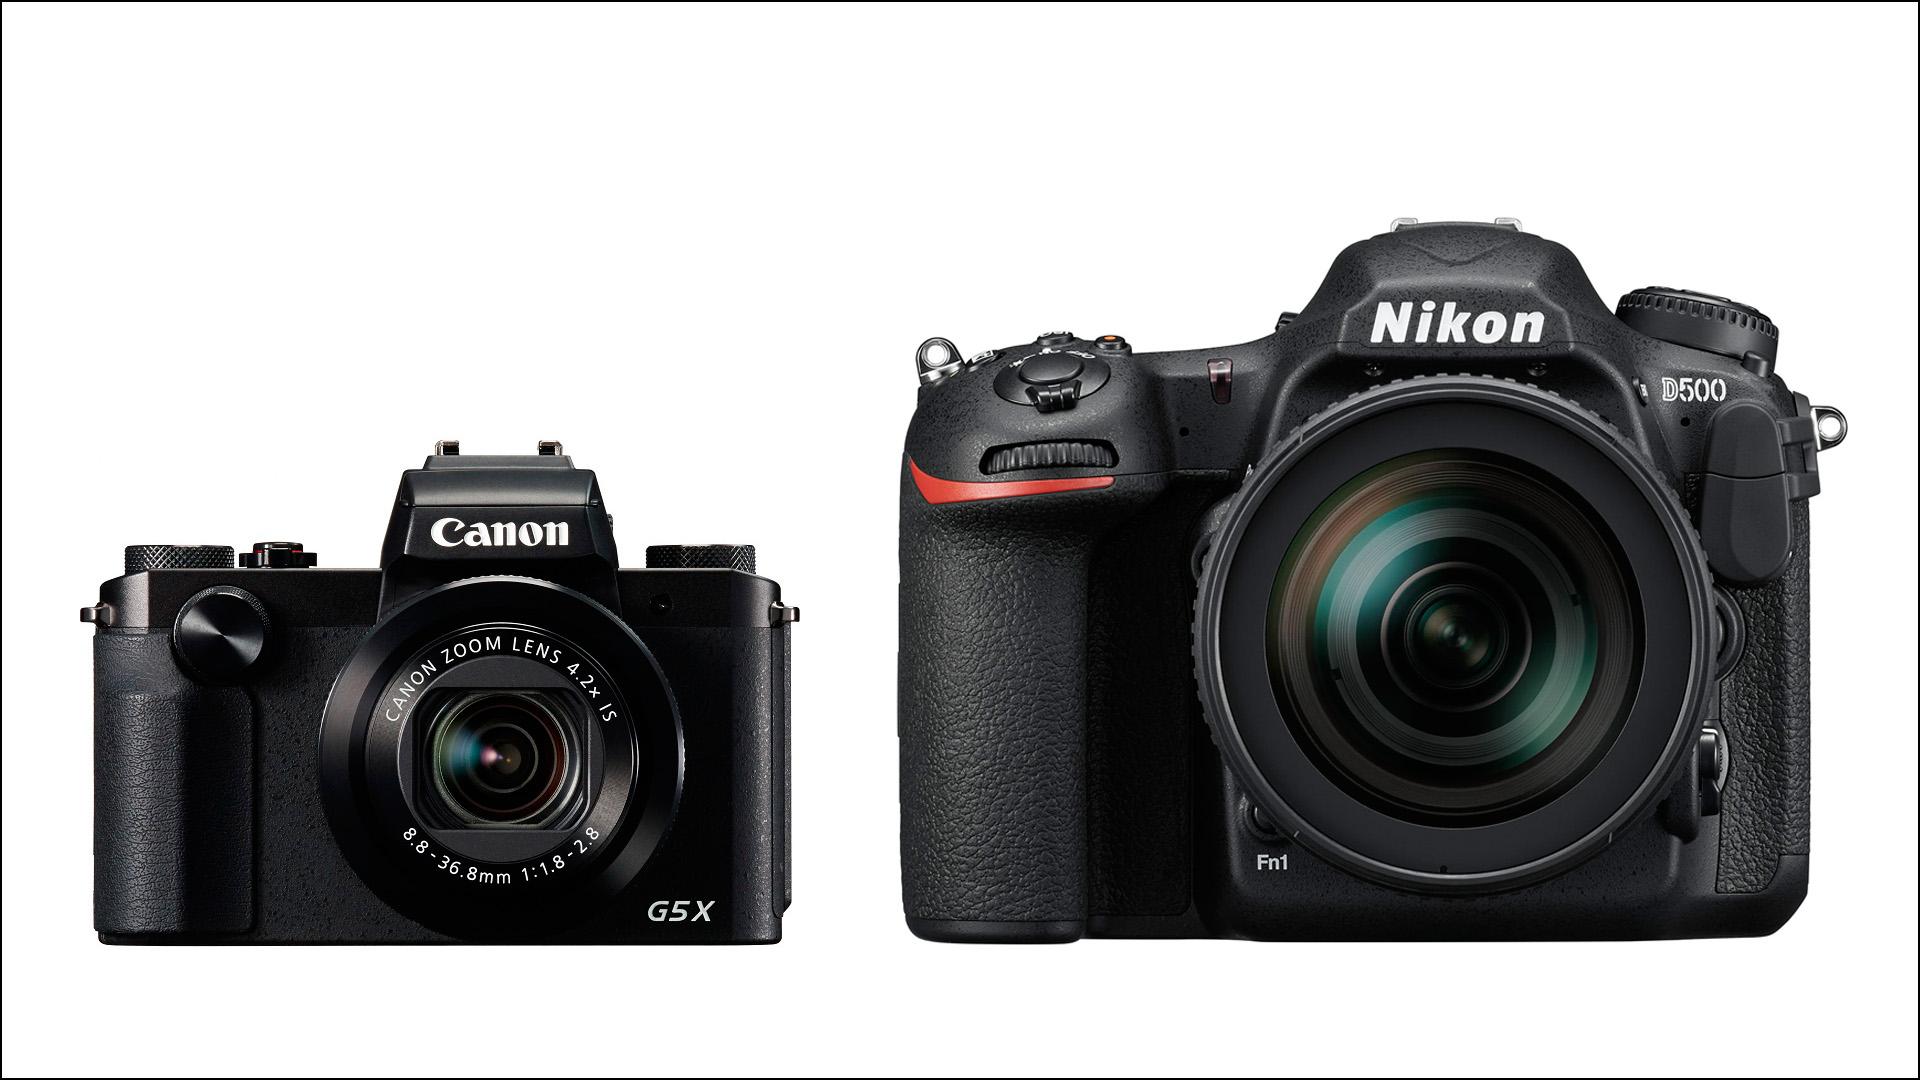 Nikon D500. Canon PowerShot G5 X.